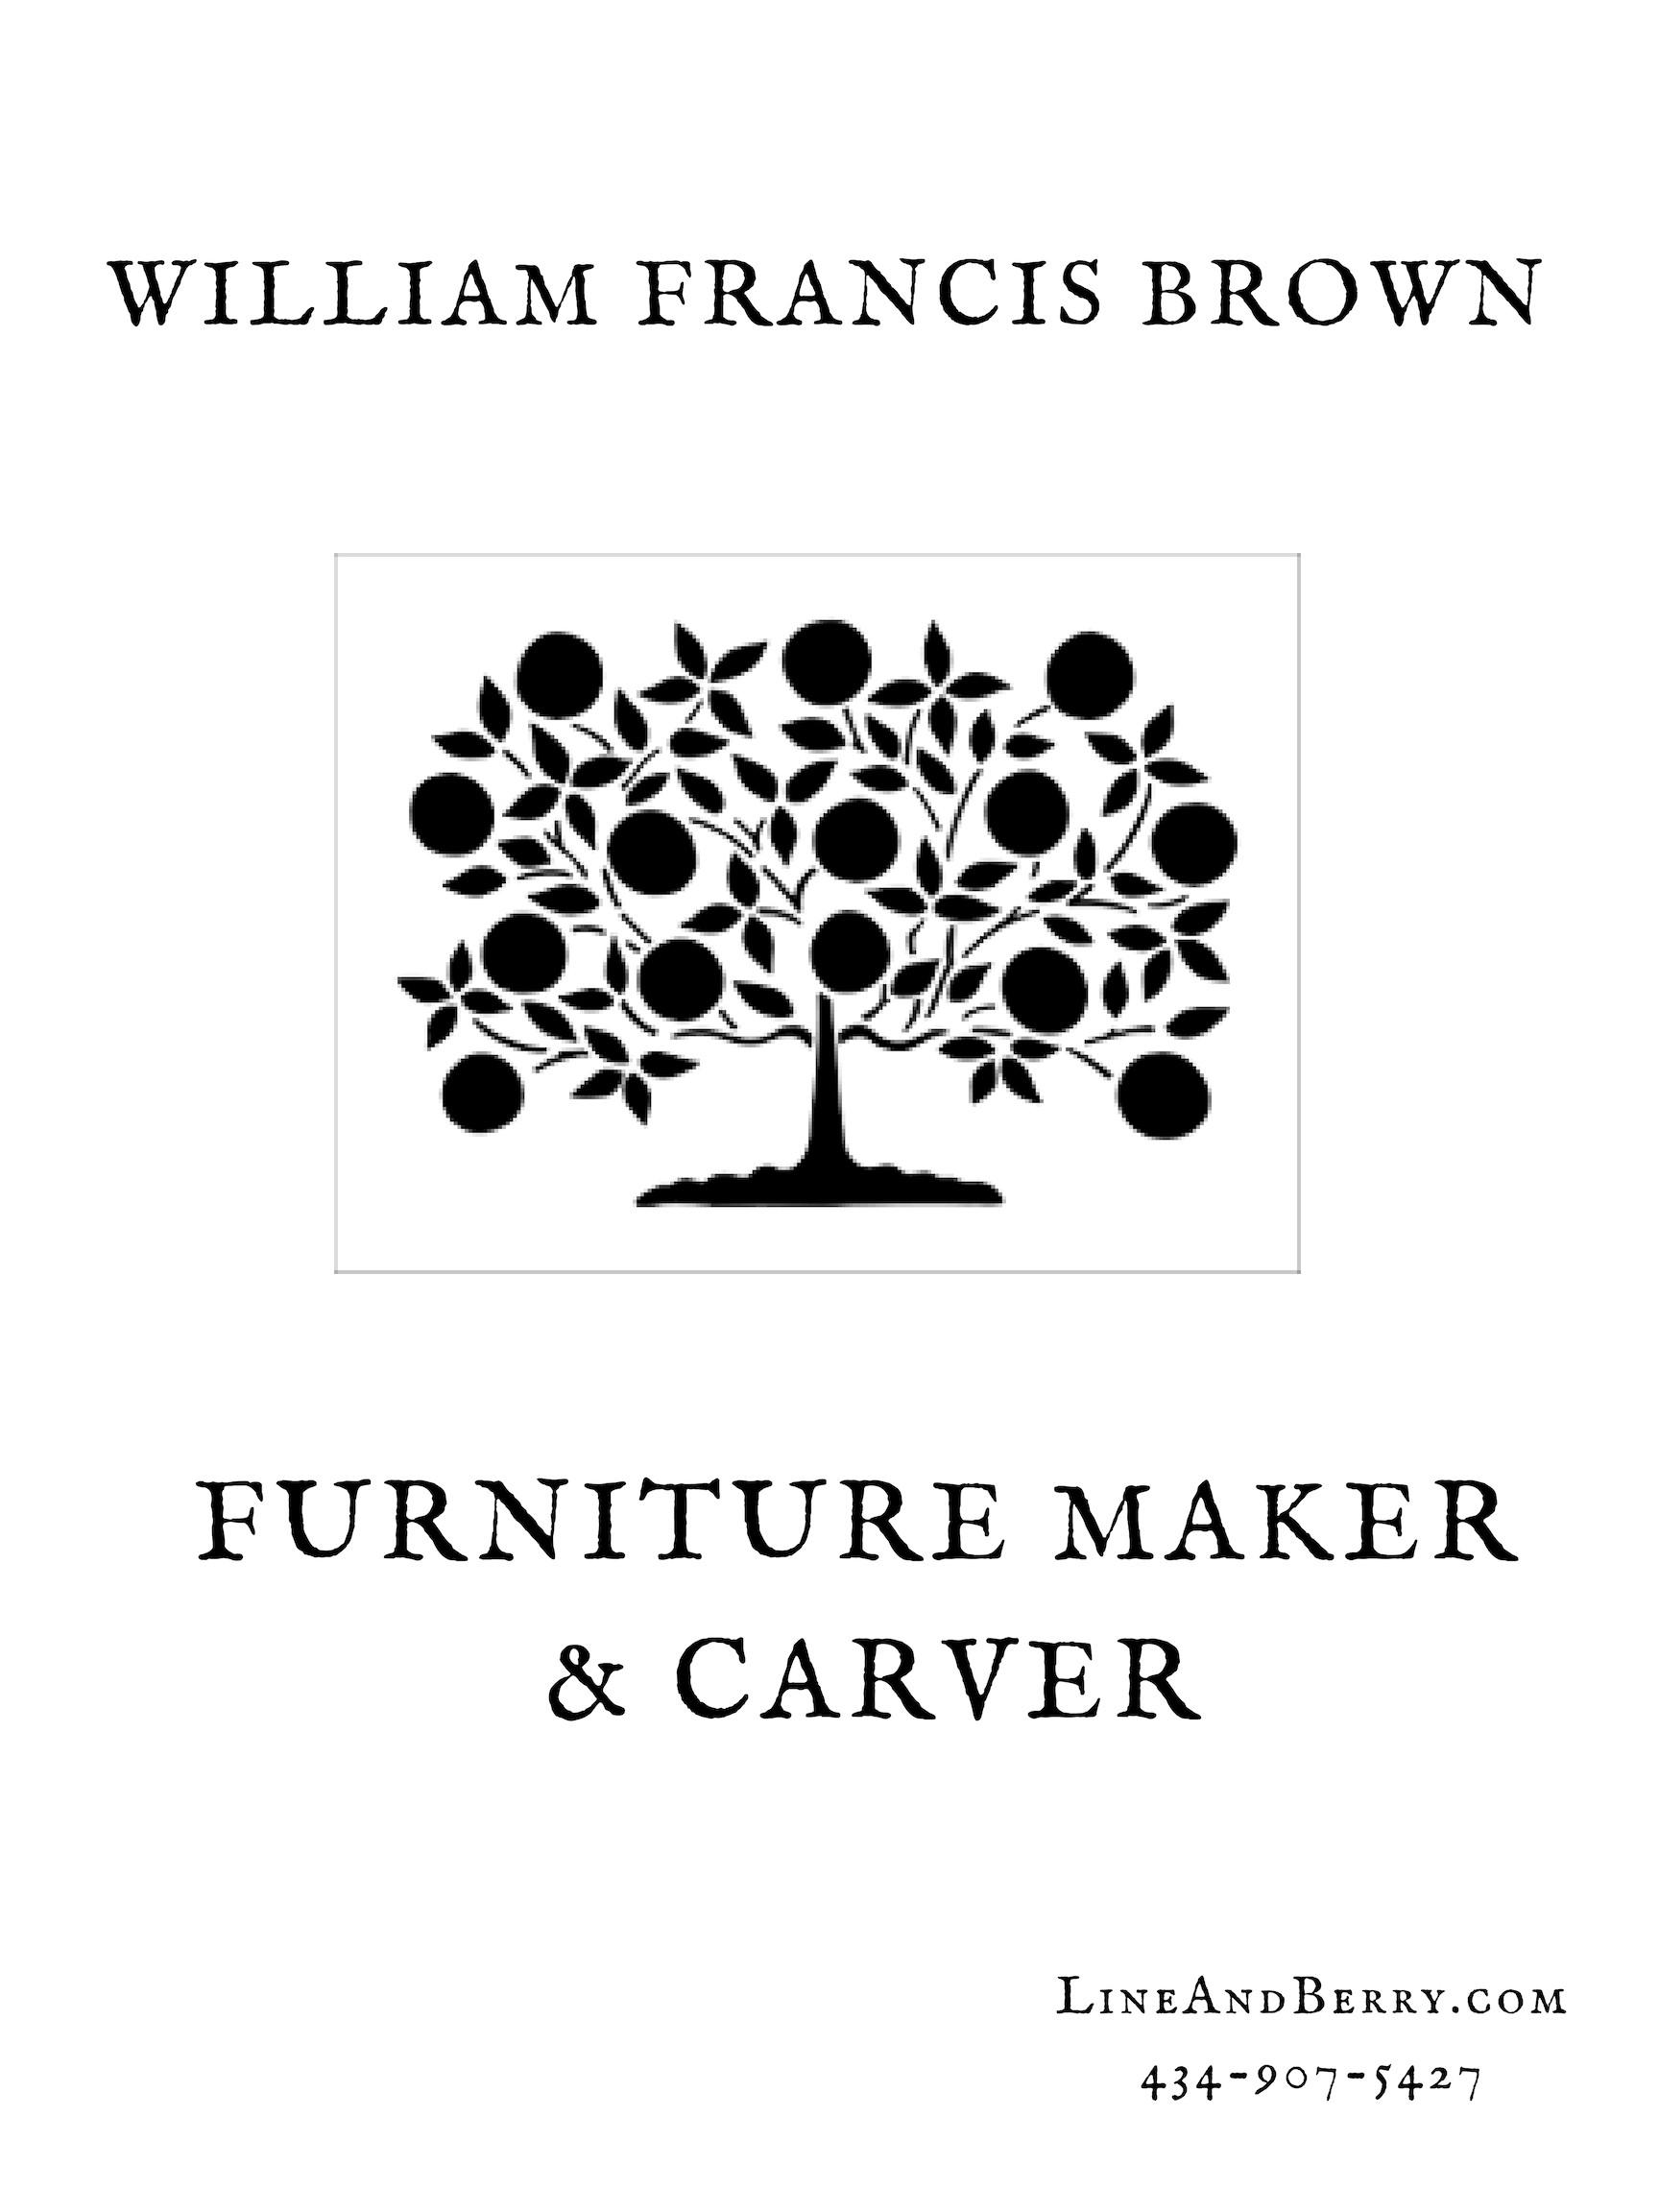 William Francis Brown|LineAndBerry.com|Fine Furniture